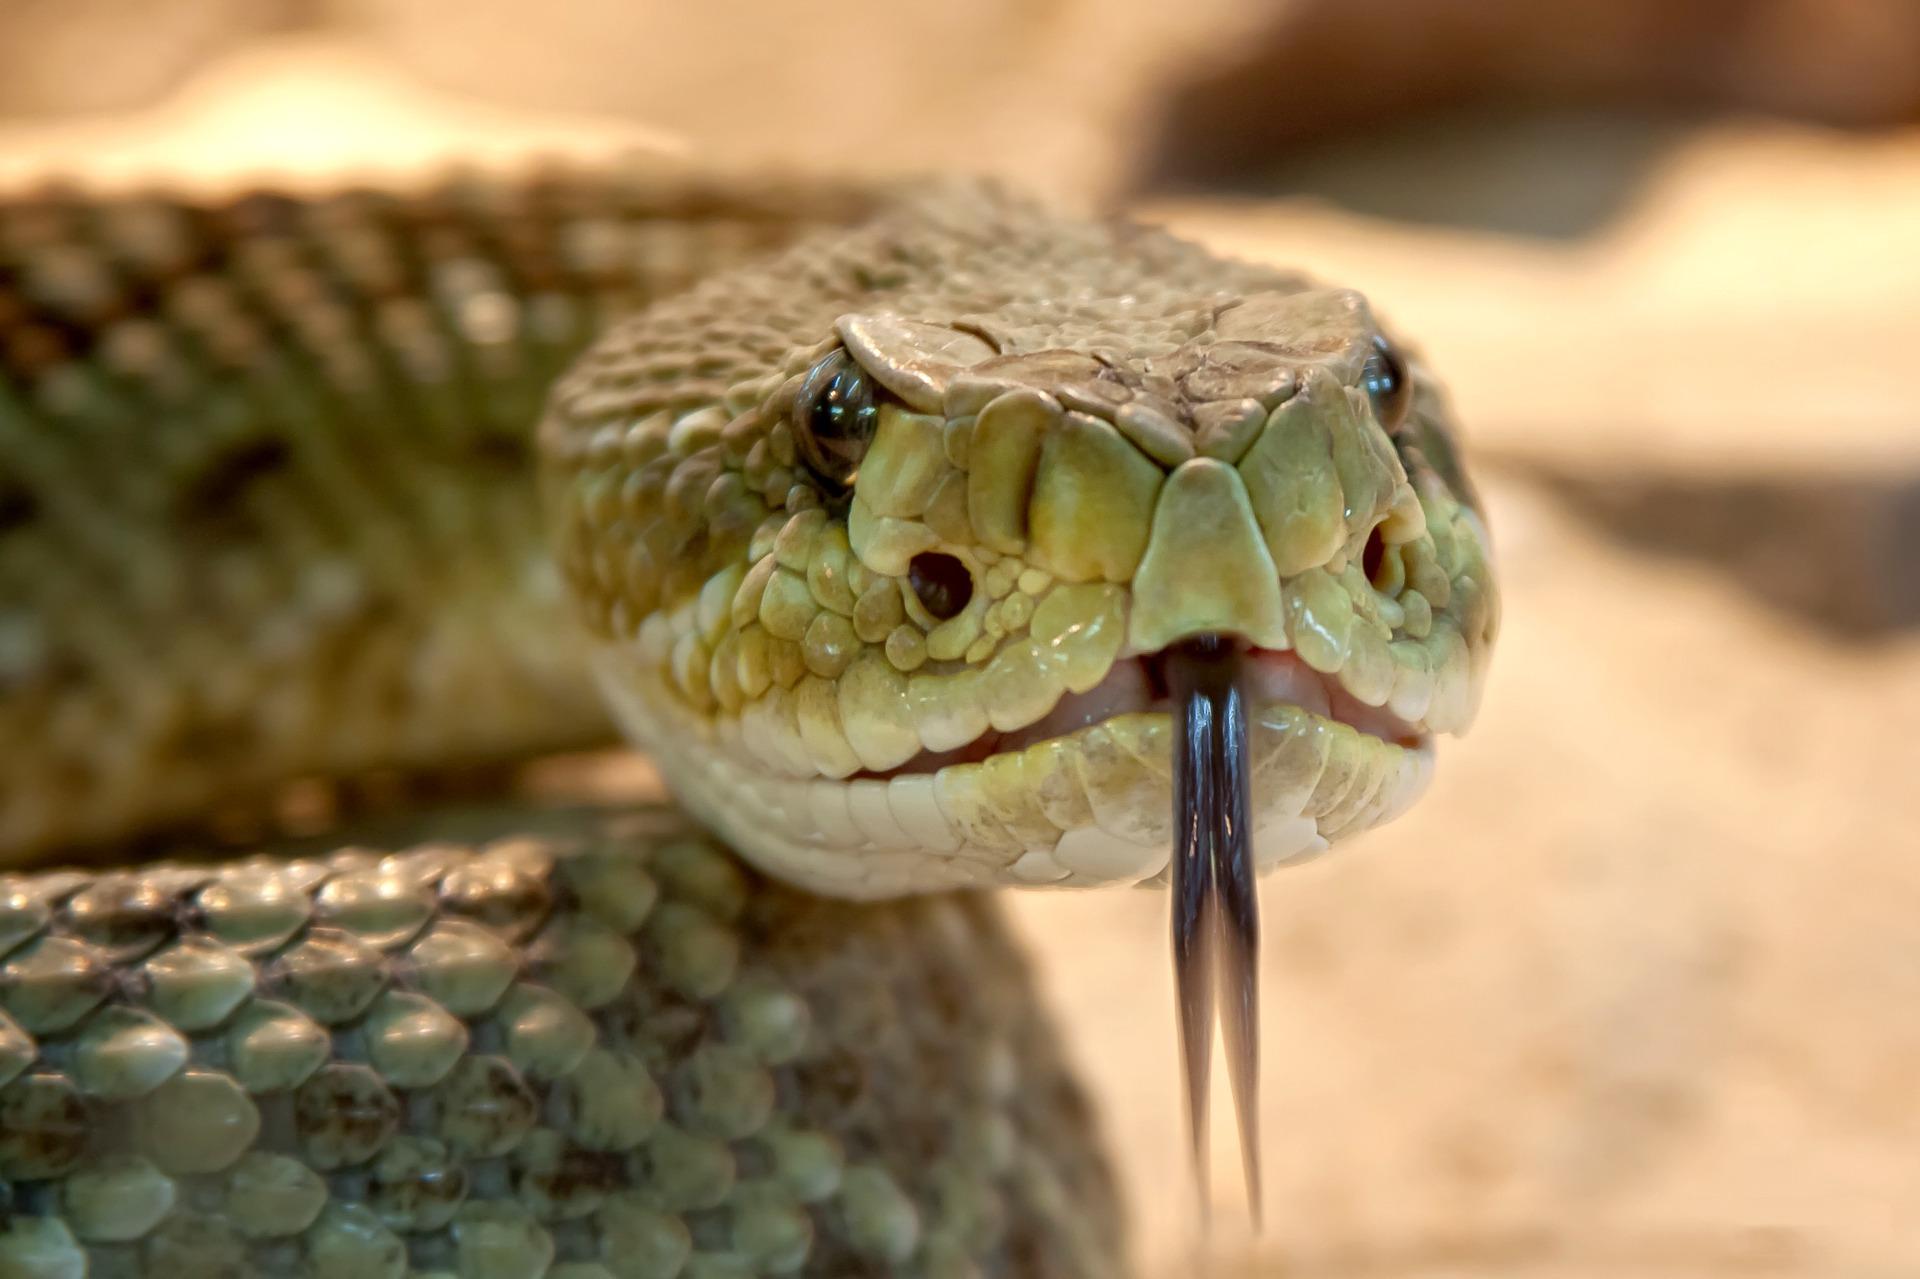 ce inseamna cand visezi serpi - sfatulparintilor.ro - pixabay_com - rattlesnake-653642_1920